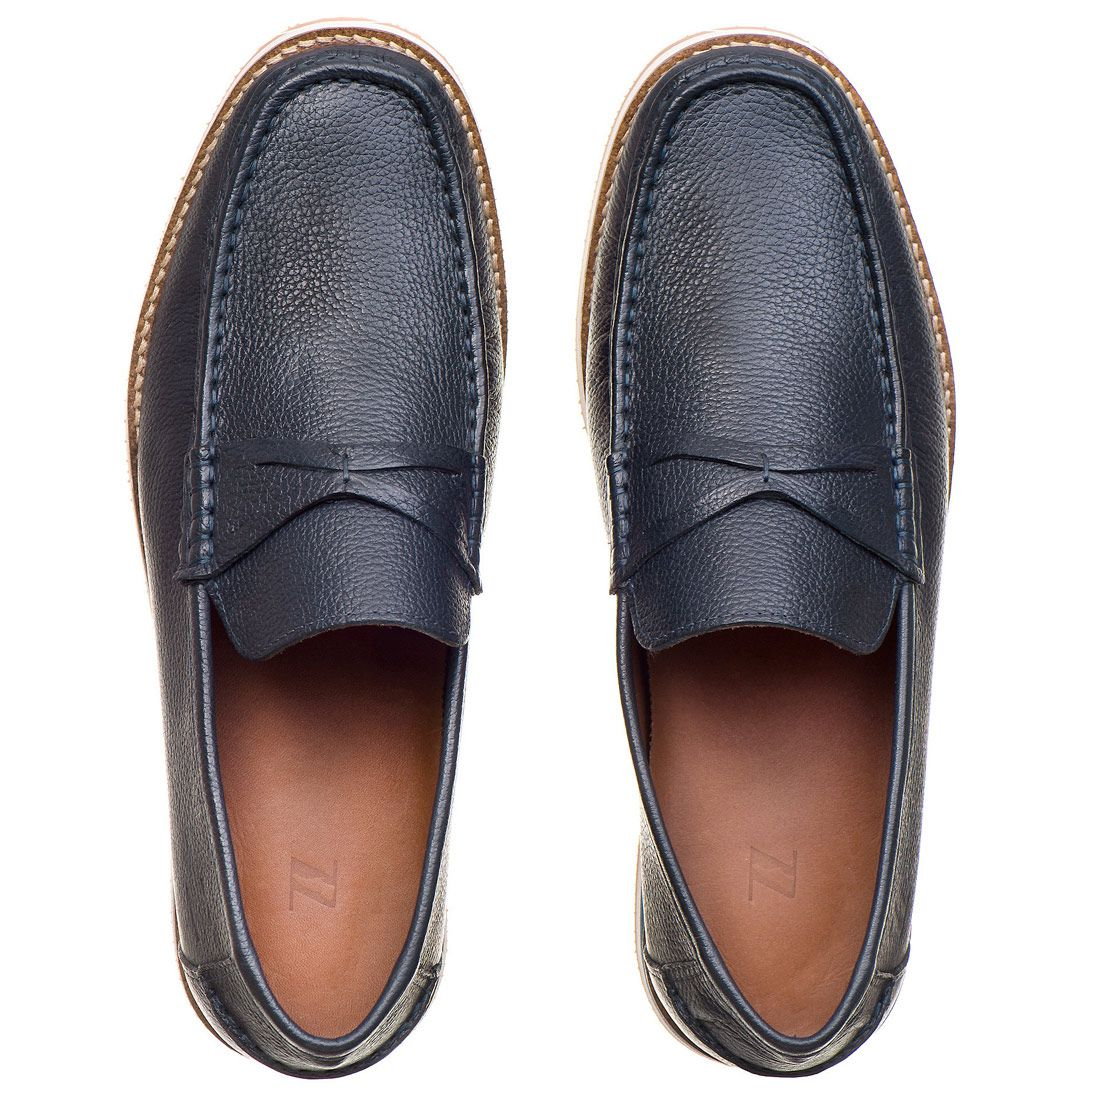 Sapato Casual Masculino em Couro Floather Marinho Rocco Lorenzzo - 4503